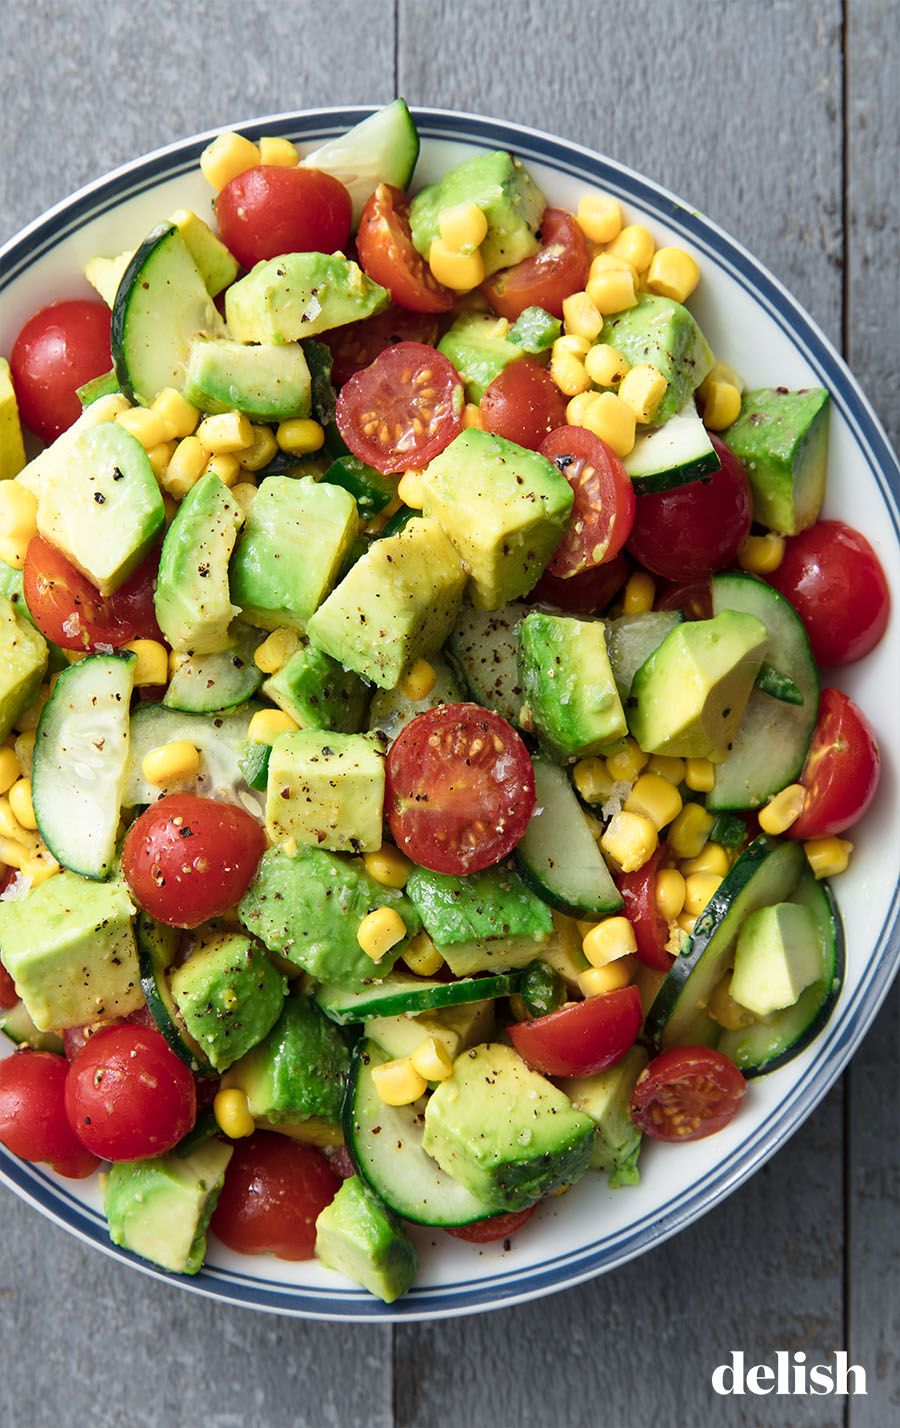 60 Easy Summer Salad Recipes Healthy Salad Ideas For Summer